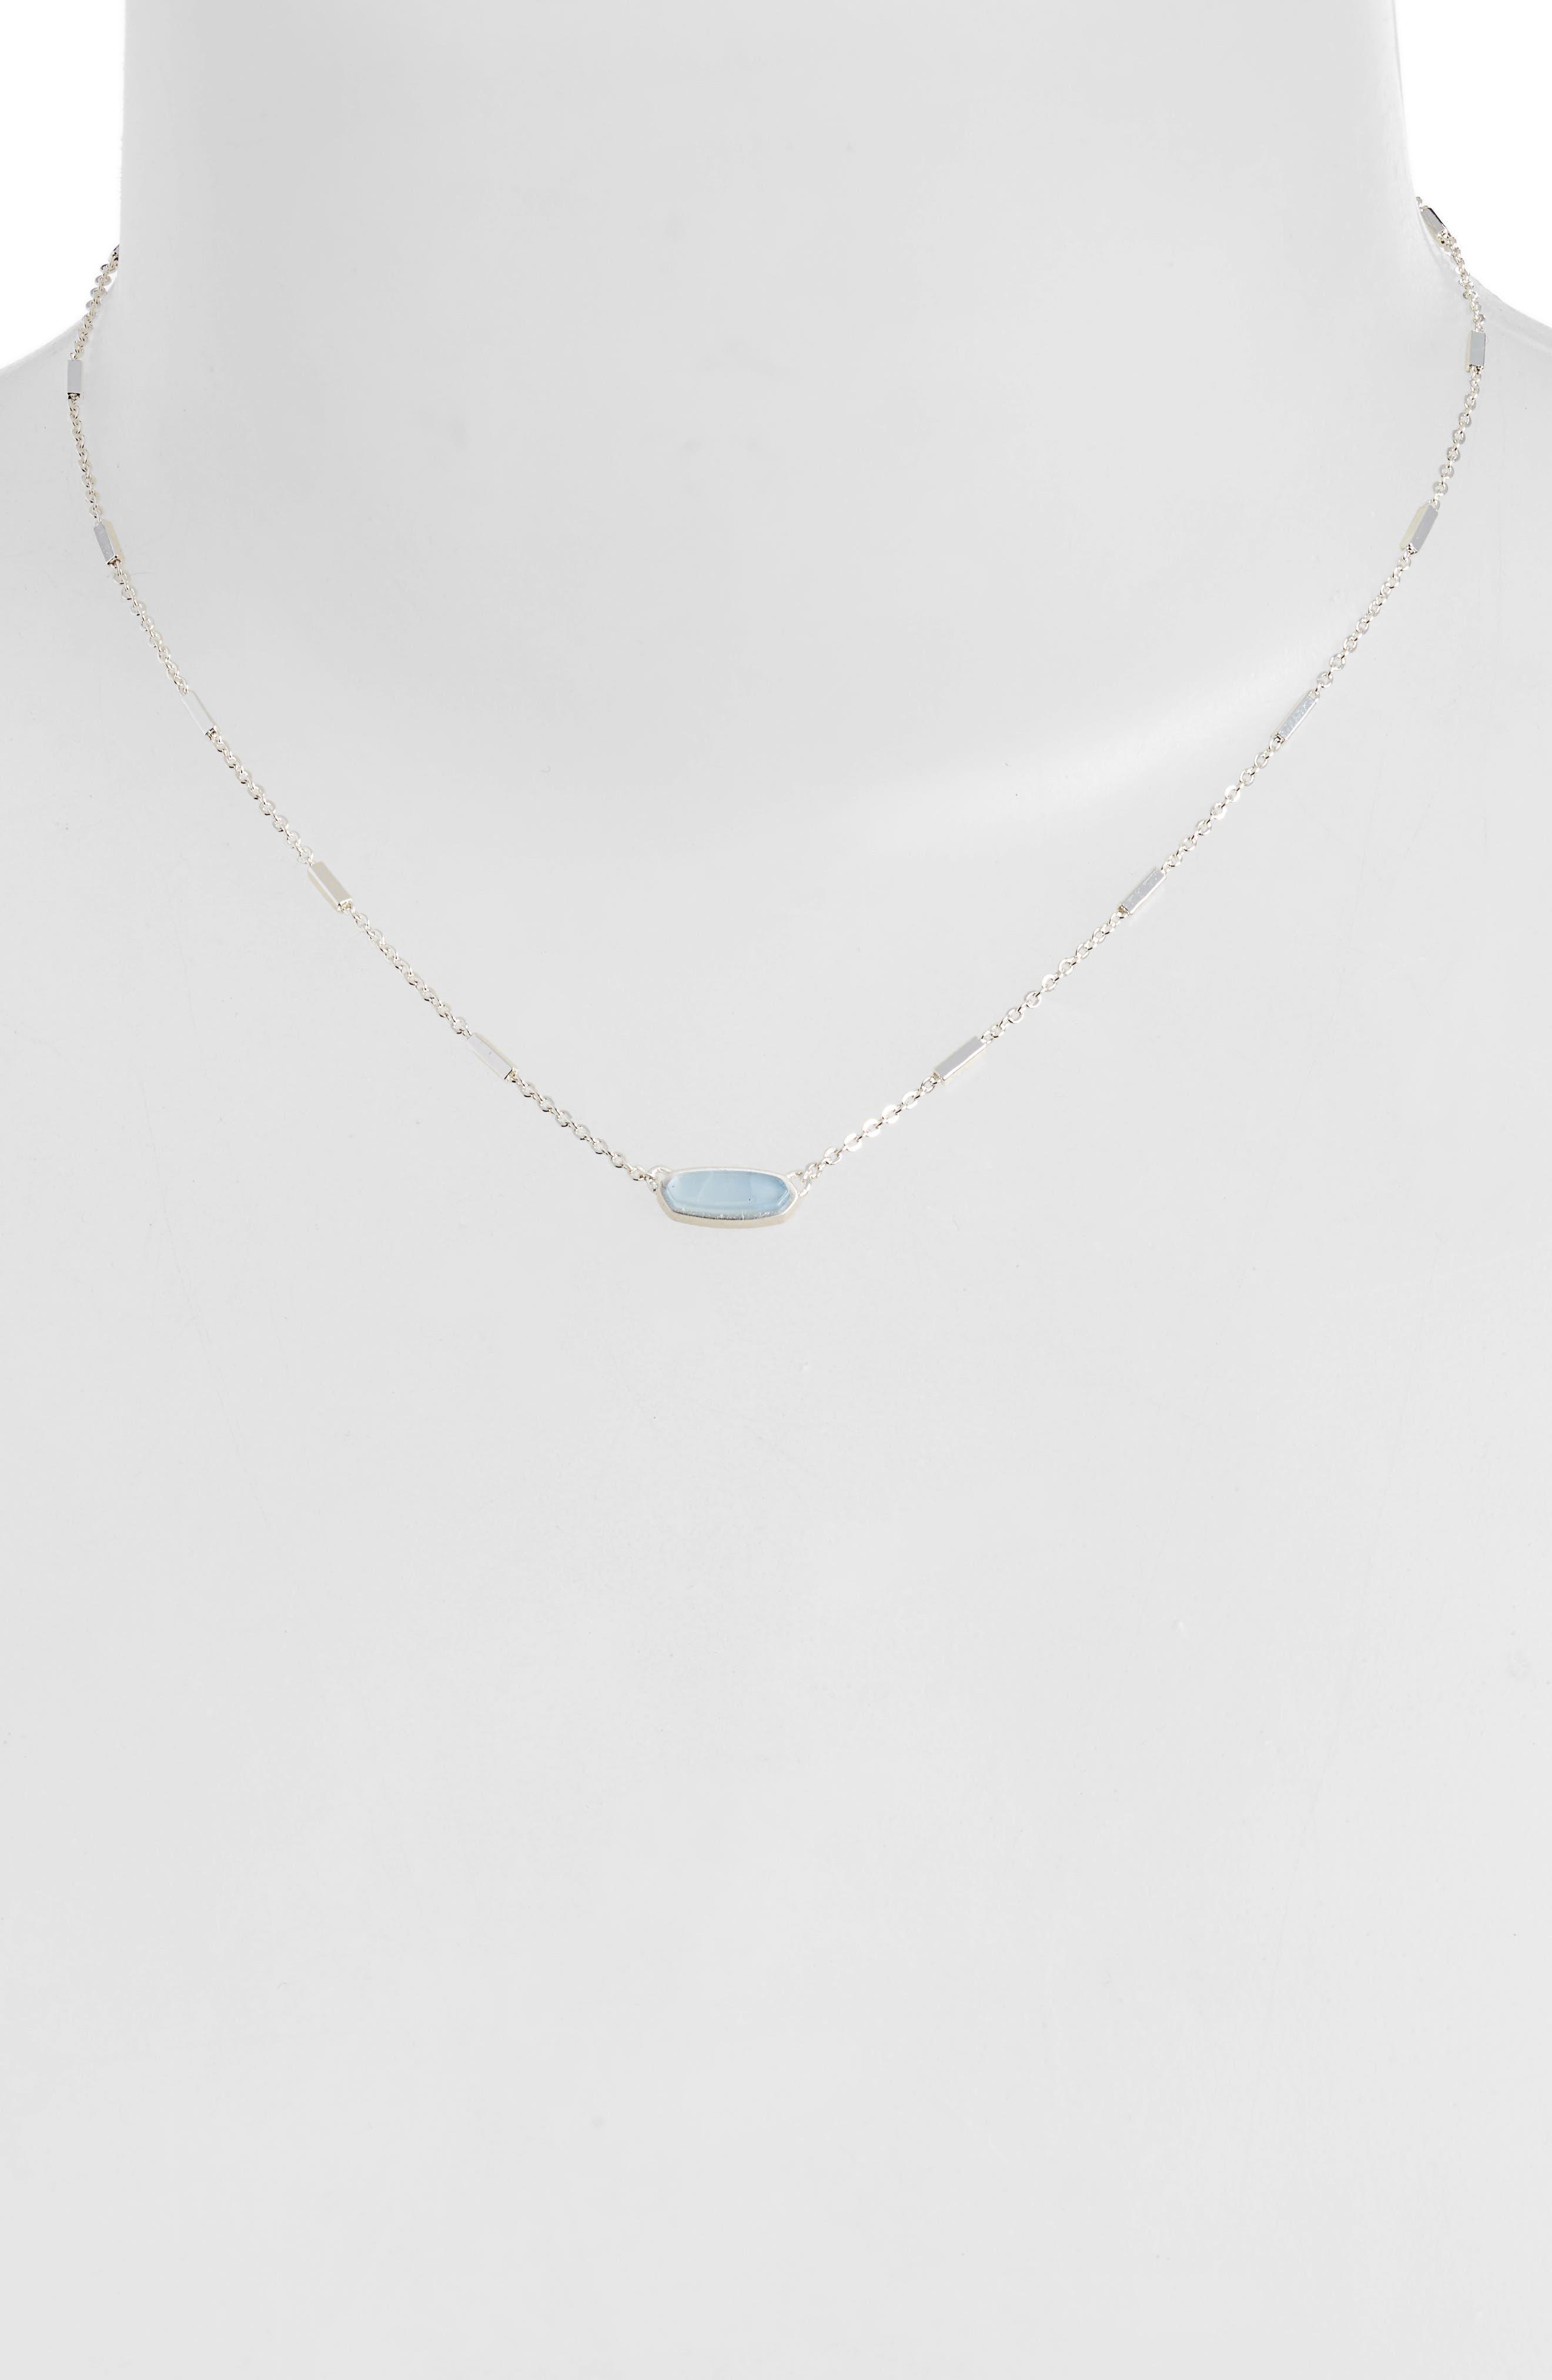 KENDRA SCOTT, Miya East/West Pendant Necklace, Main thumbnail 1, color, 400